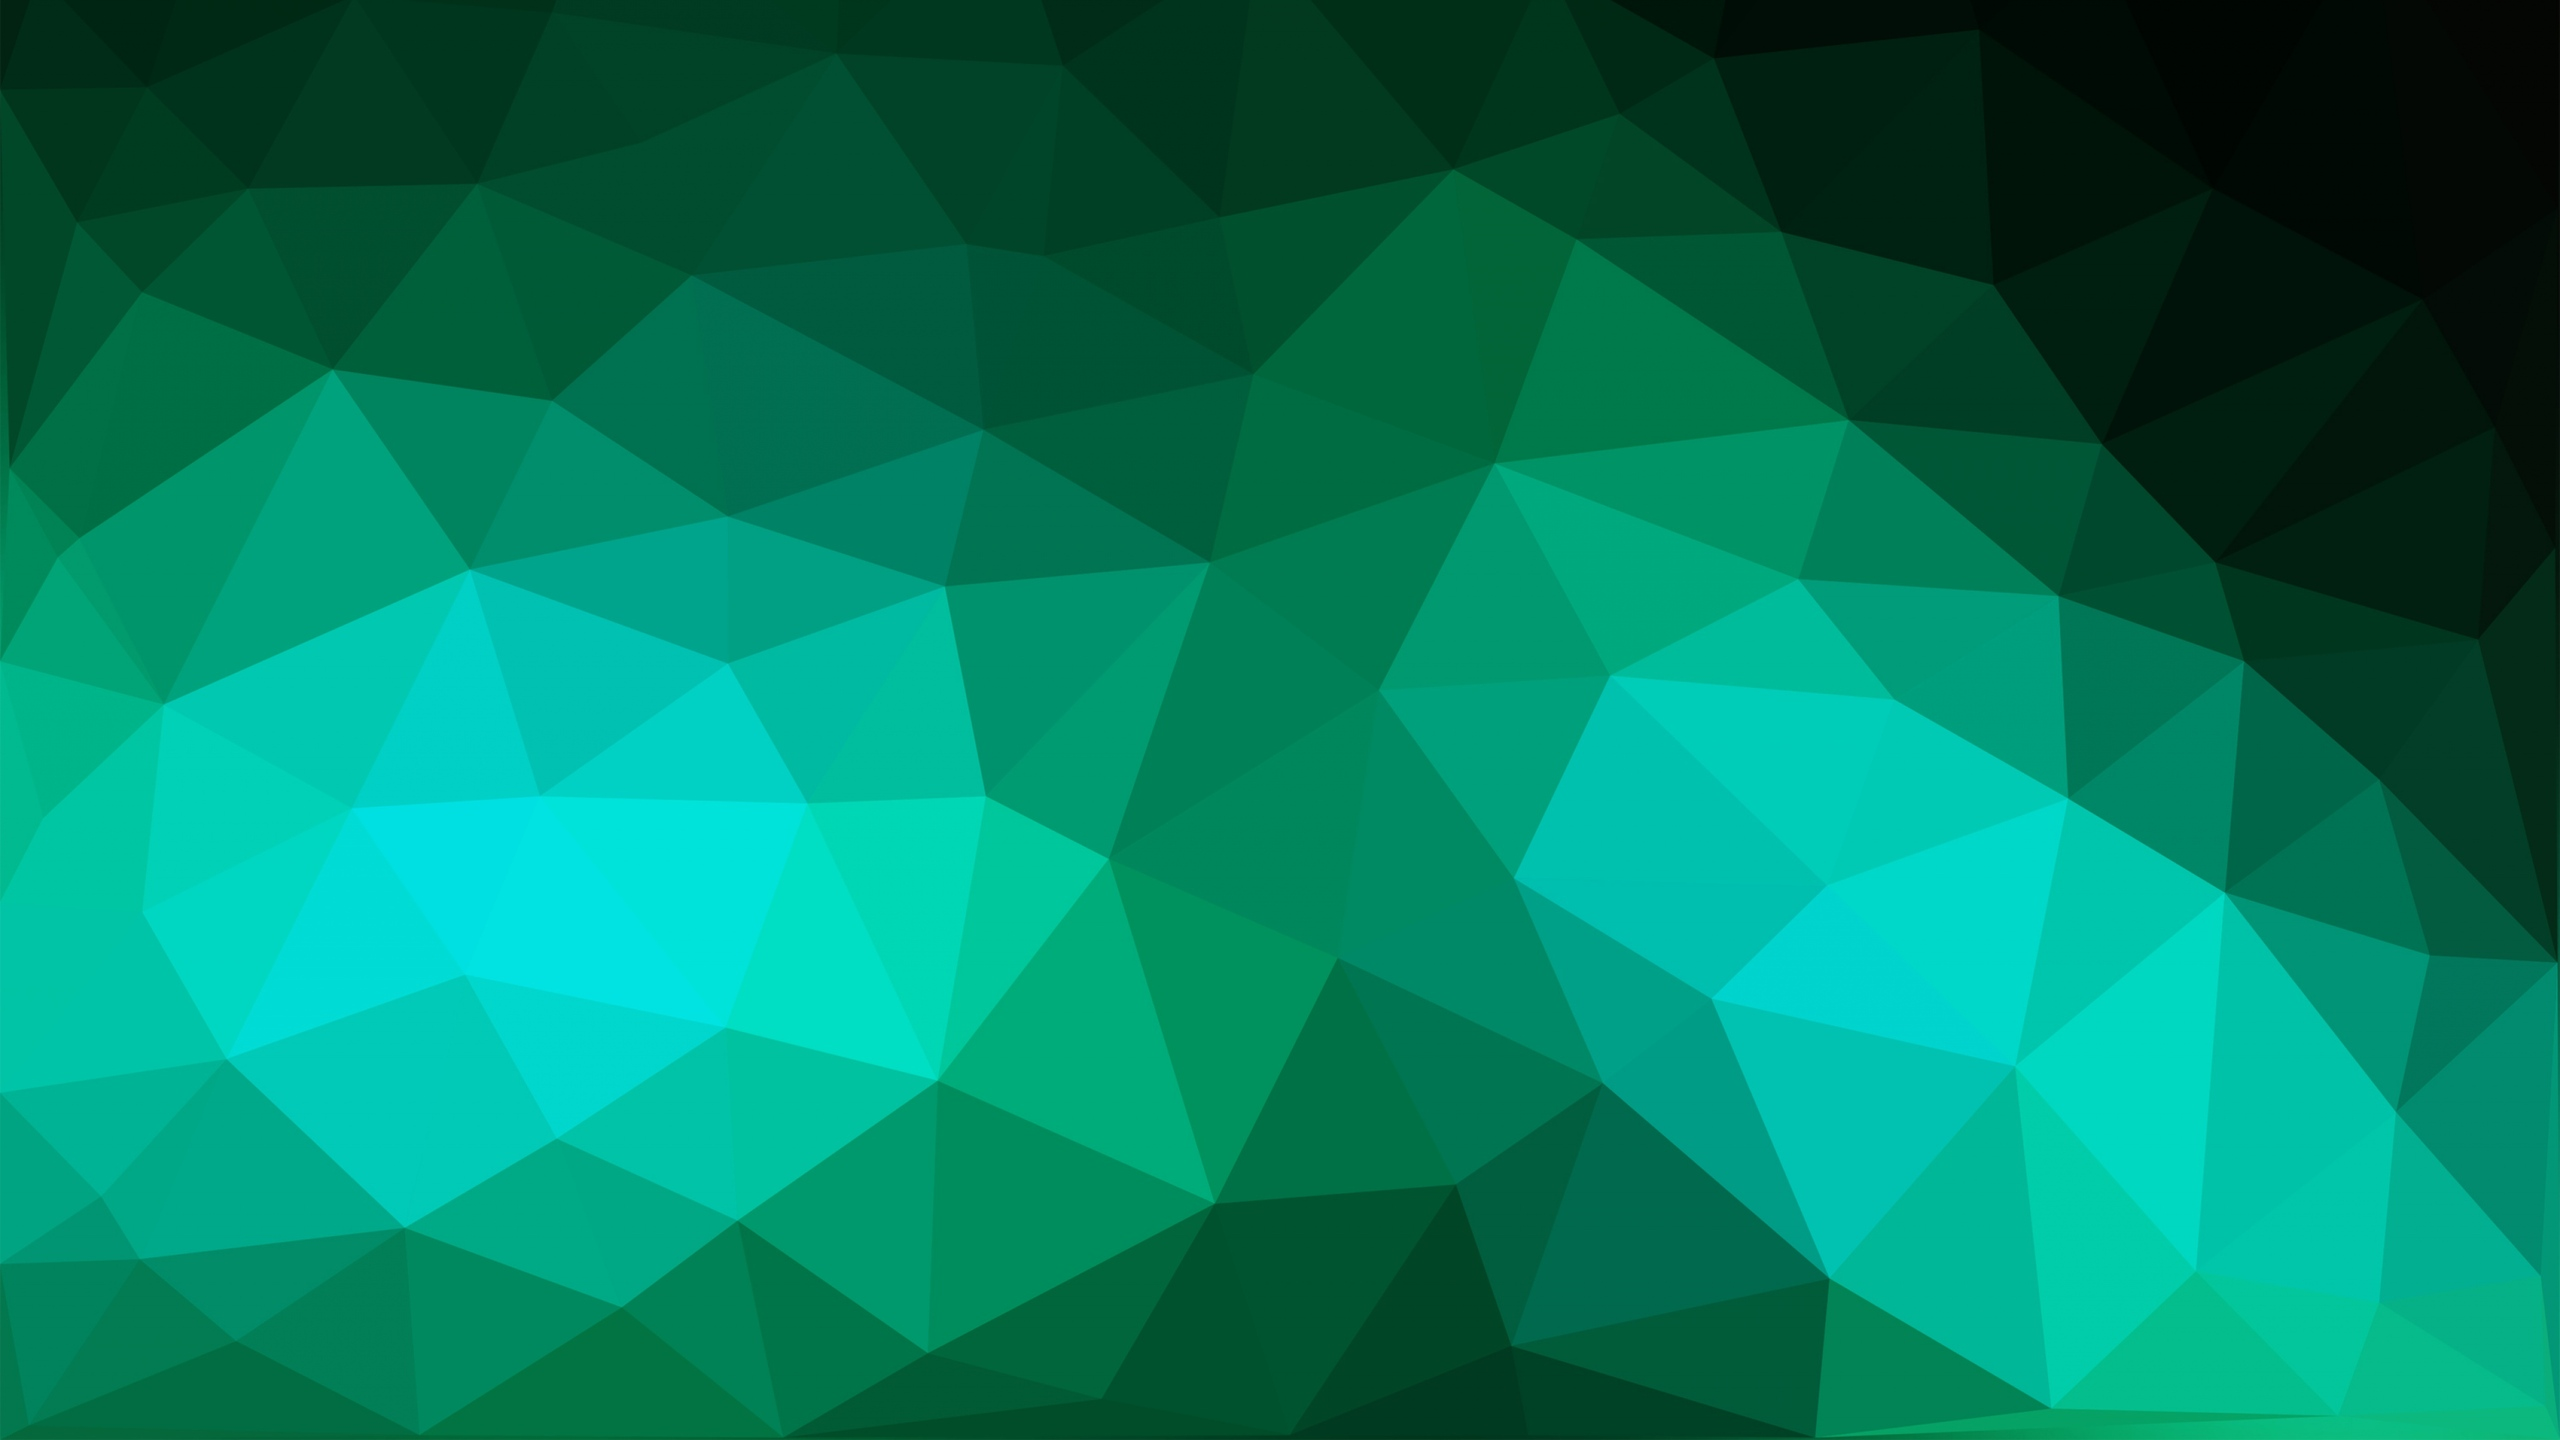 1440p Wallpaper Girls 2560x1440 Polygon Texture 1440p Resolution Hd 4k